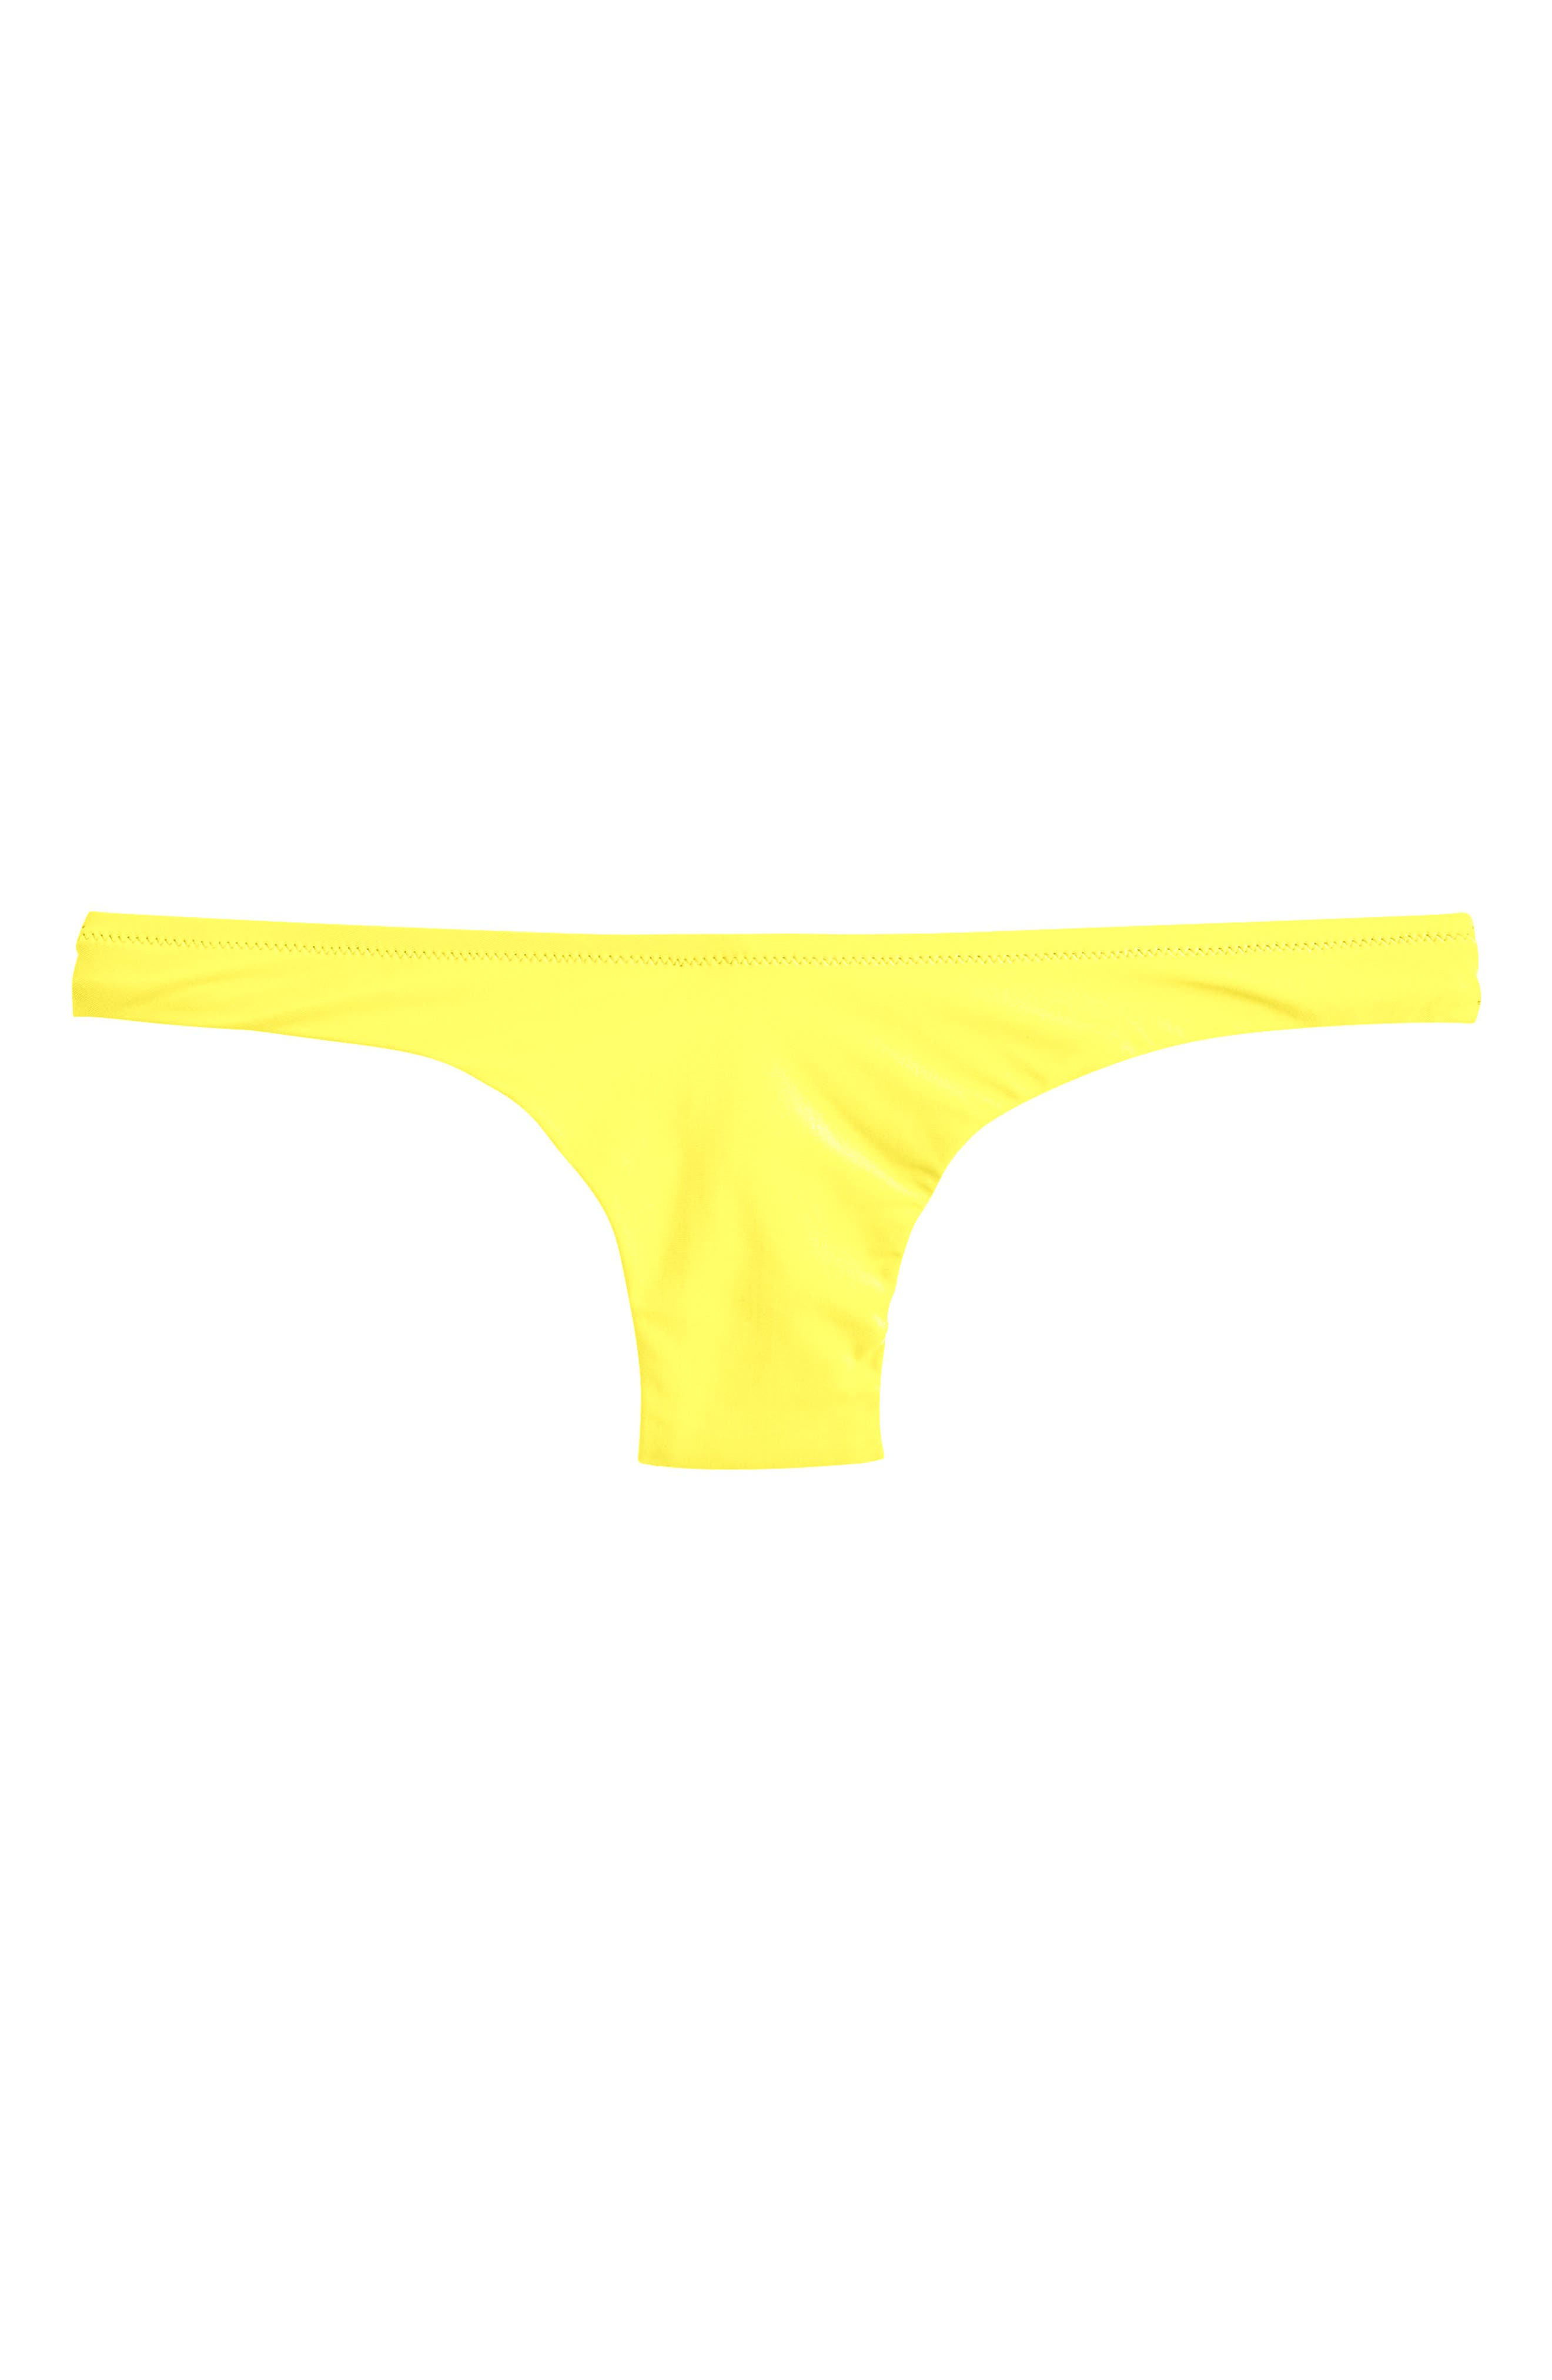 Lowrider Bikini Bottoms,                         Main,                         color, 700